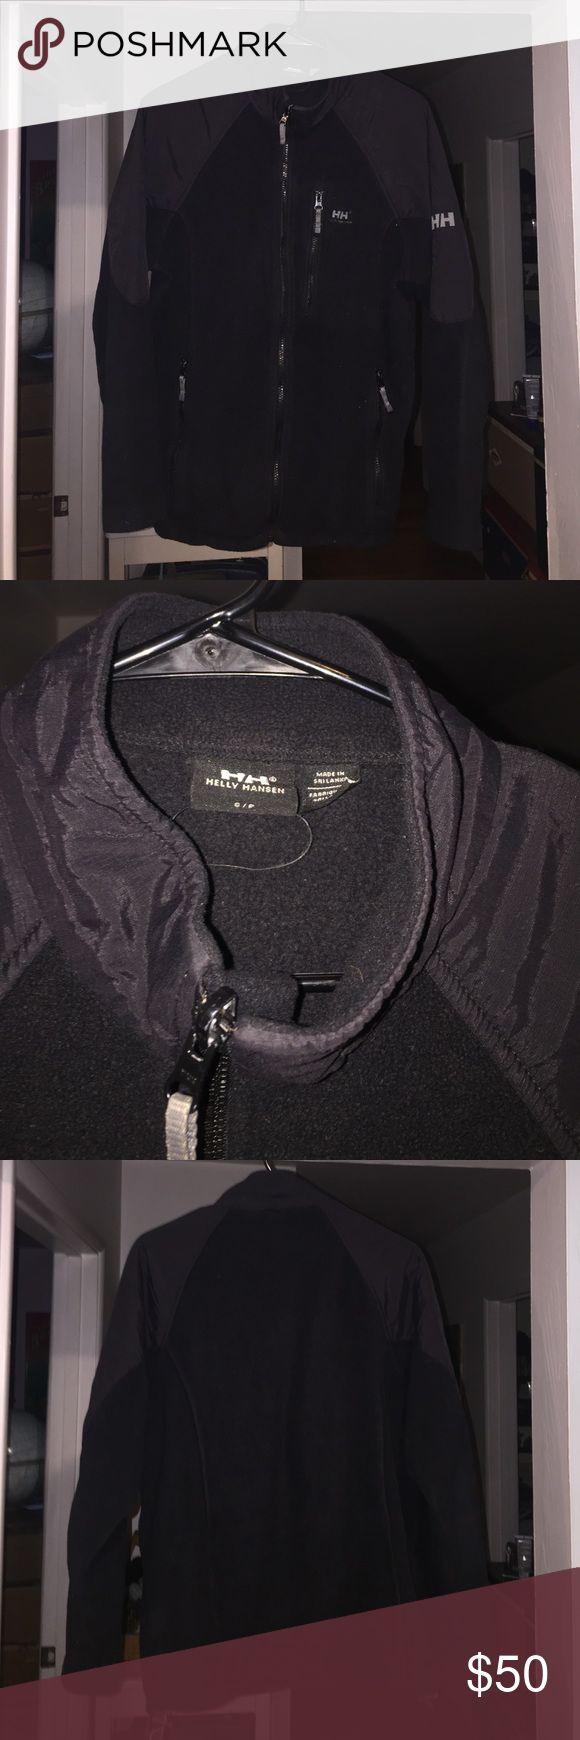 Helly hansen jacket Helly hansen jacket. Size small. Make an offer open to all Helly Hansen Jackets & Coats